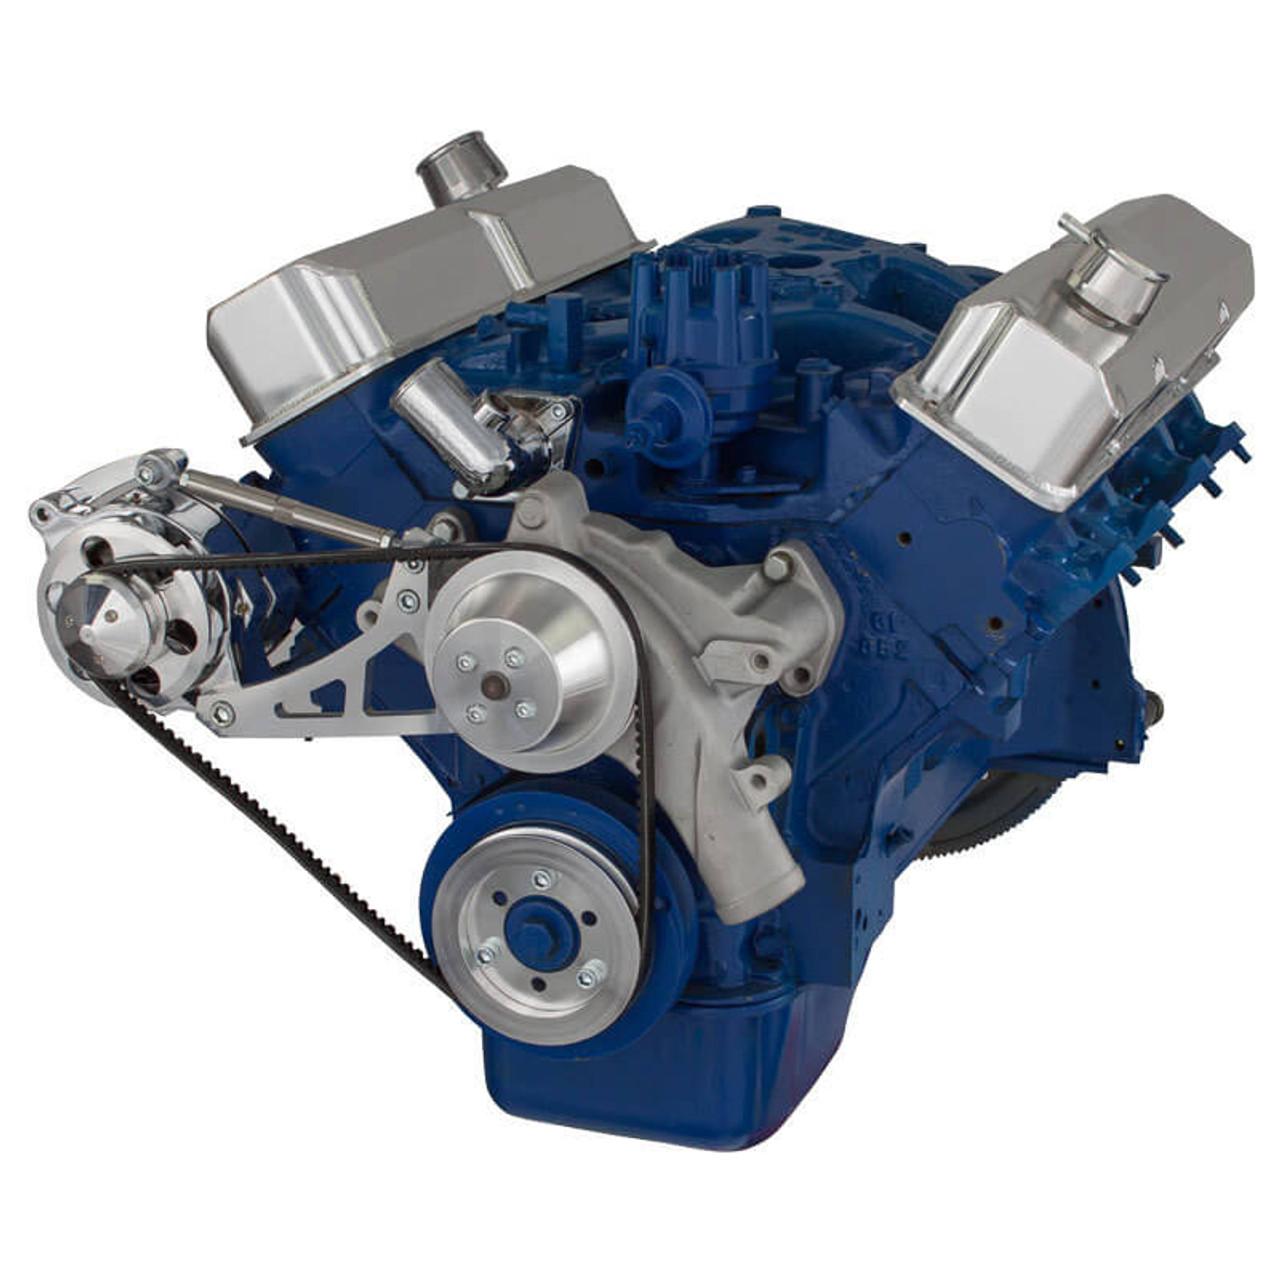 [SCHEMATICS_4US]  Ford 390 FE Engine V-Belt Pulley System - Alternator   Fe 390 Engine Diagrams On      CVF Racing